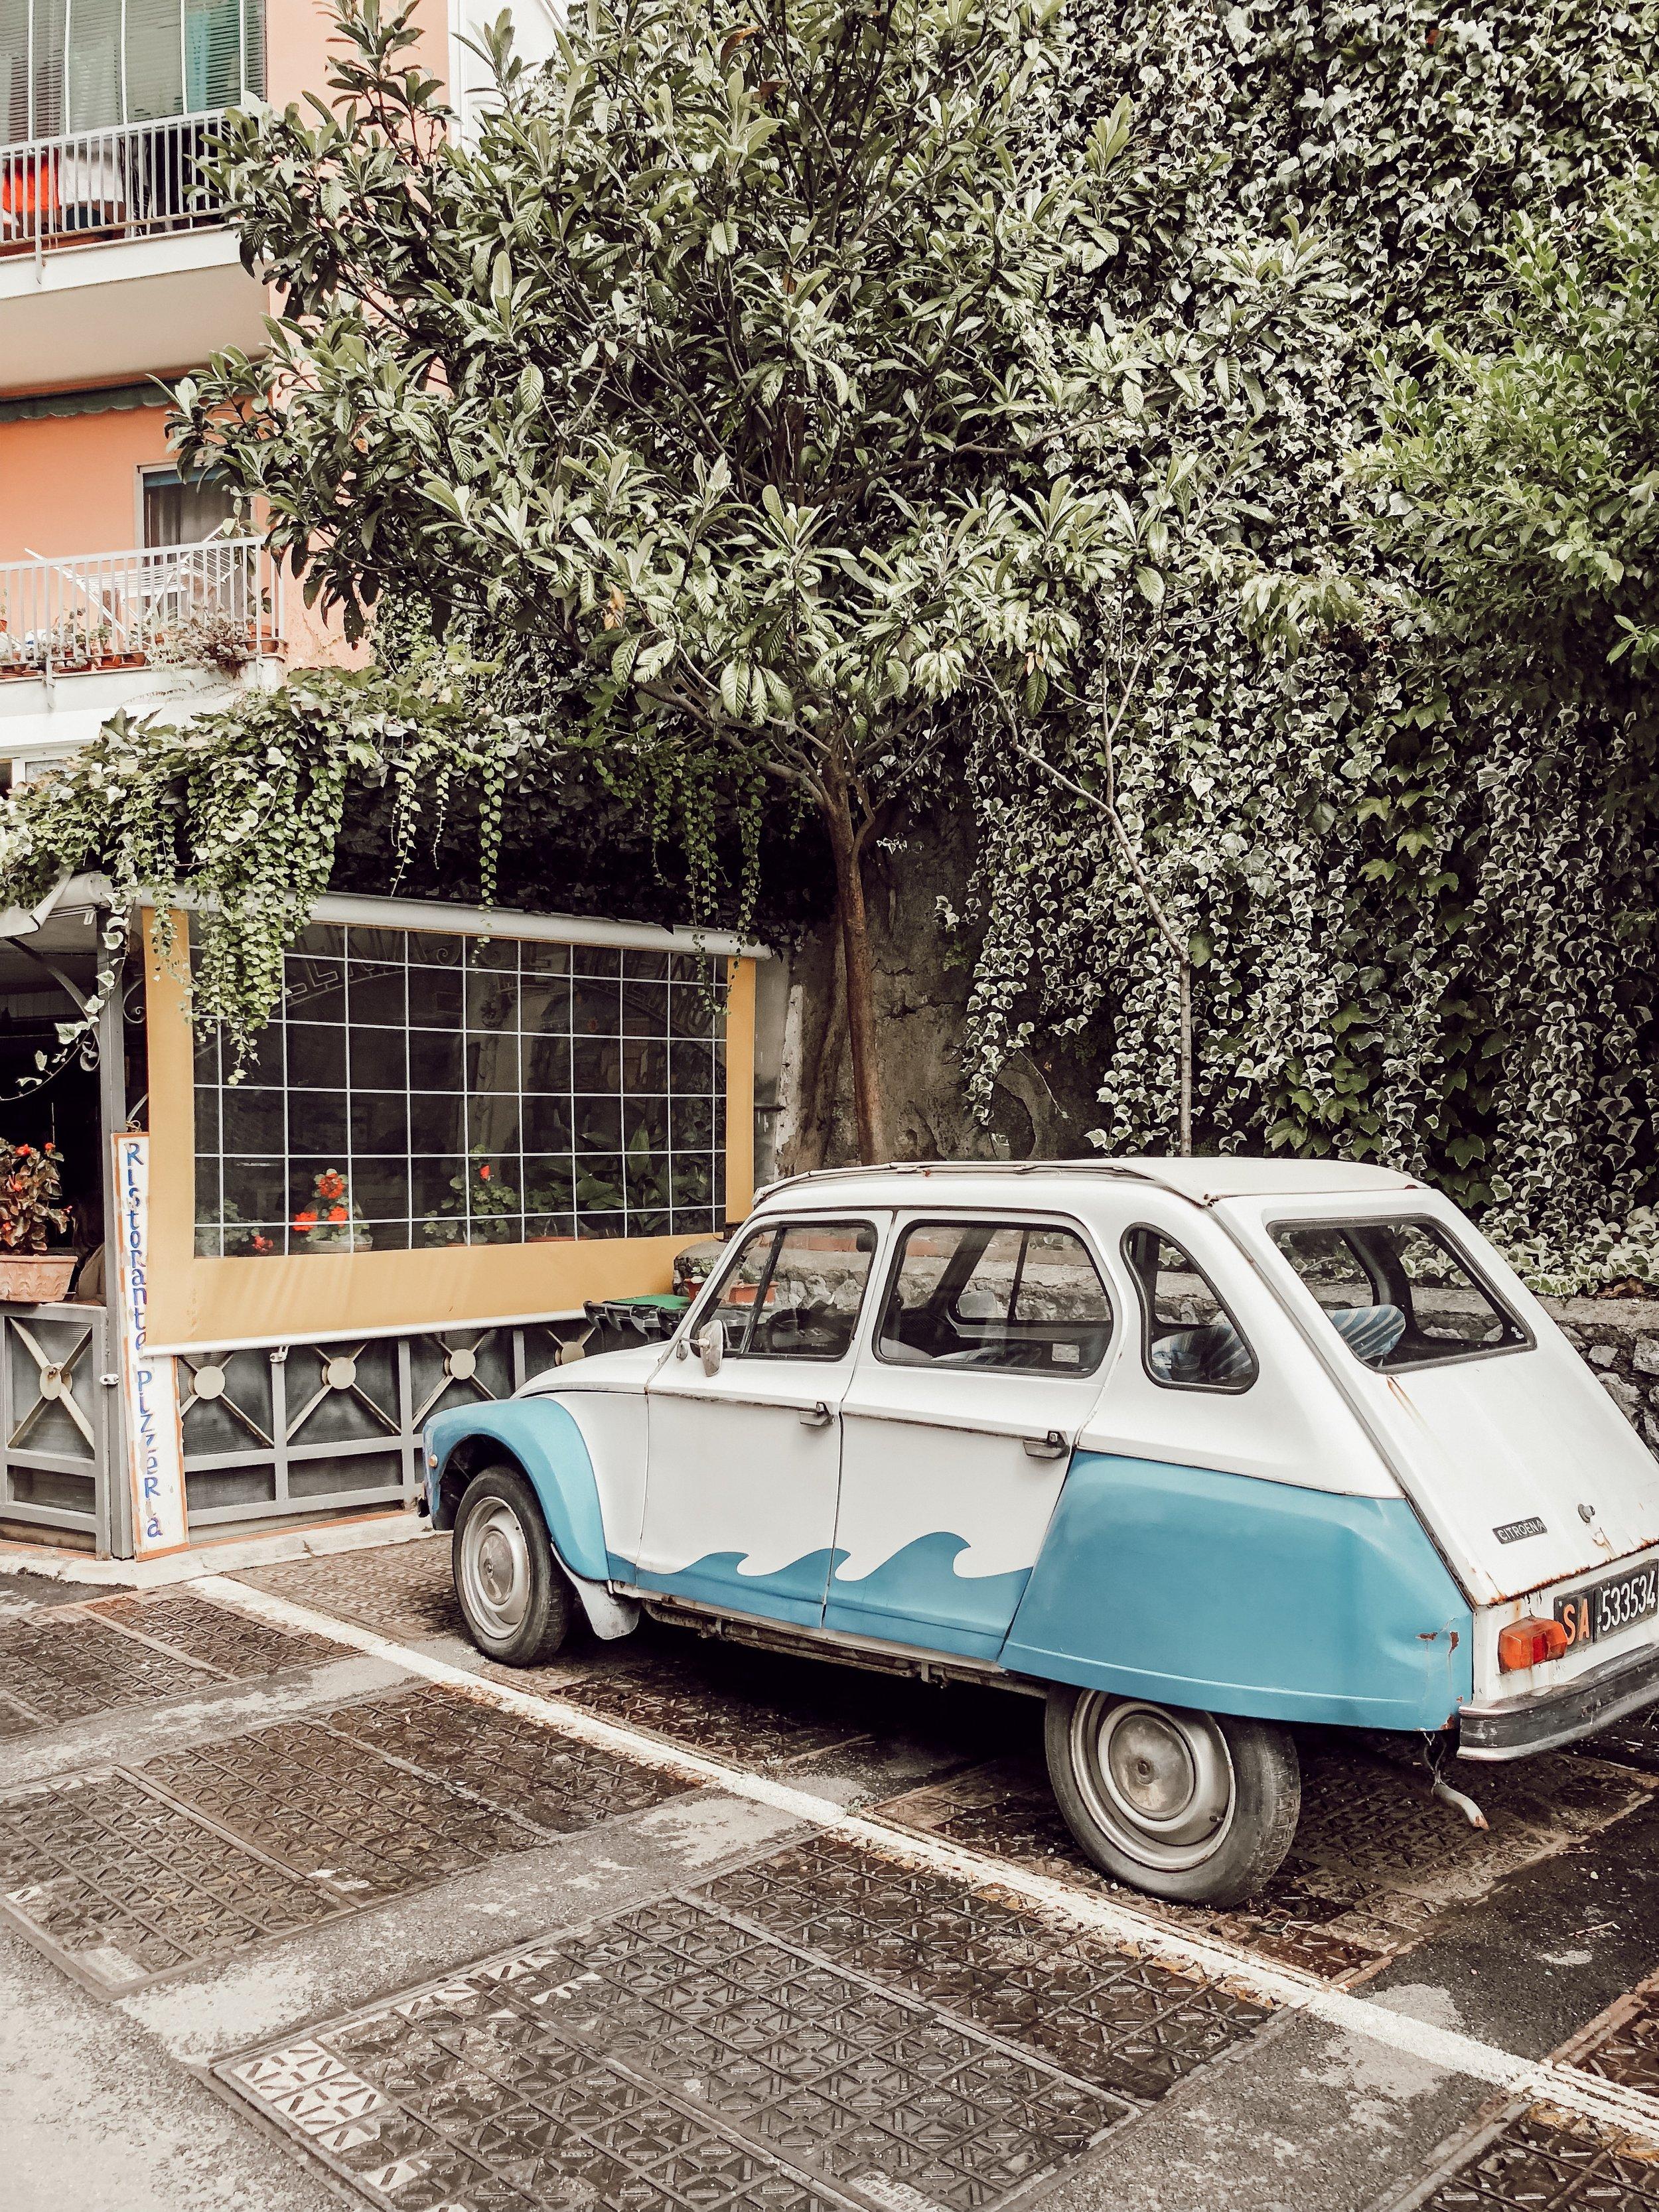 Street Car Amalfi Italy | Three Days on the Amalfi Coast, Amalfi Travel Guide, What to Do in Amalfi Italy | Miranda Schroeder Blog